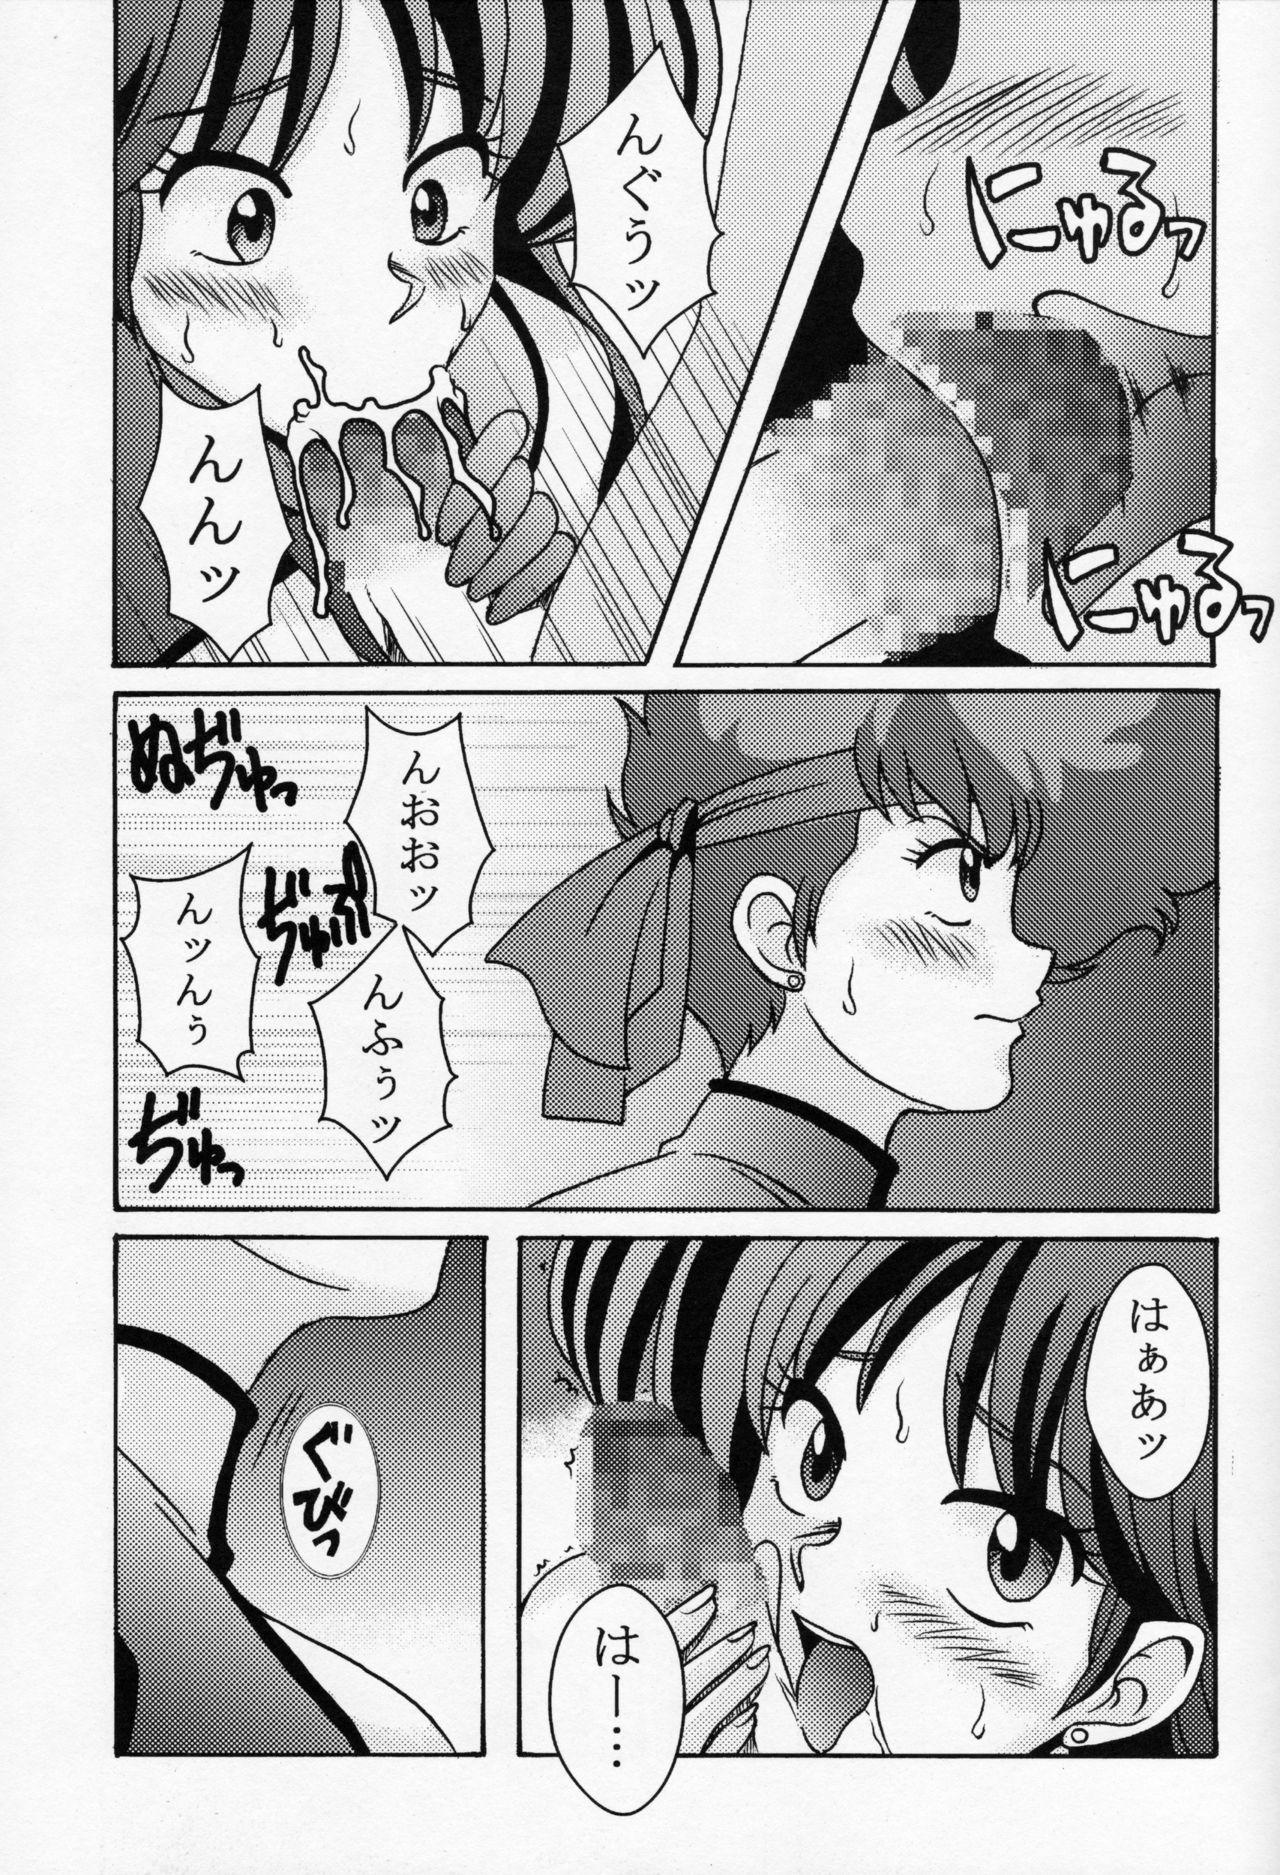 Kei to Yuri 7